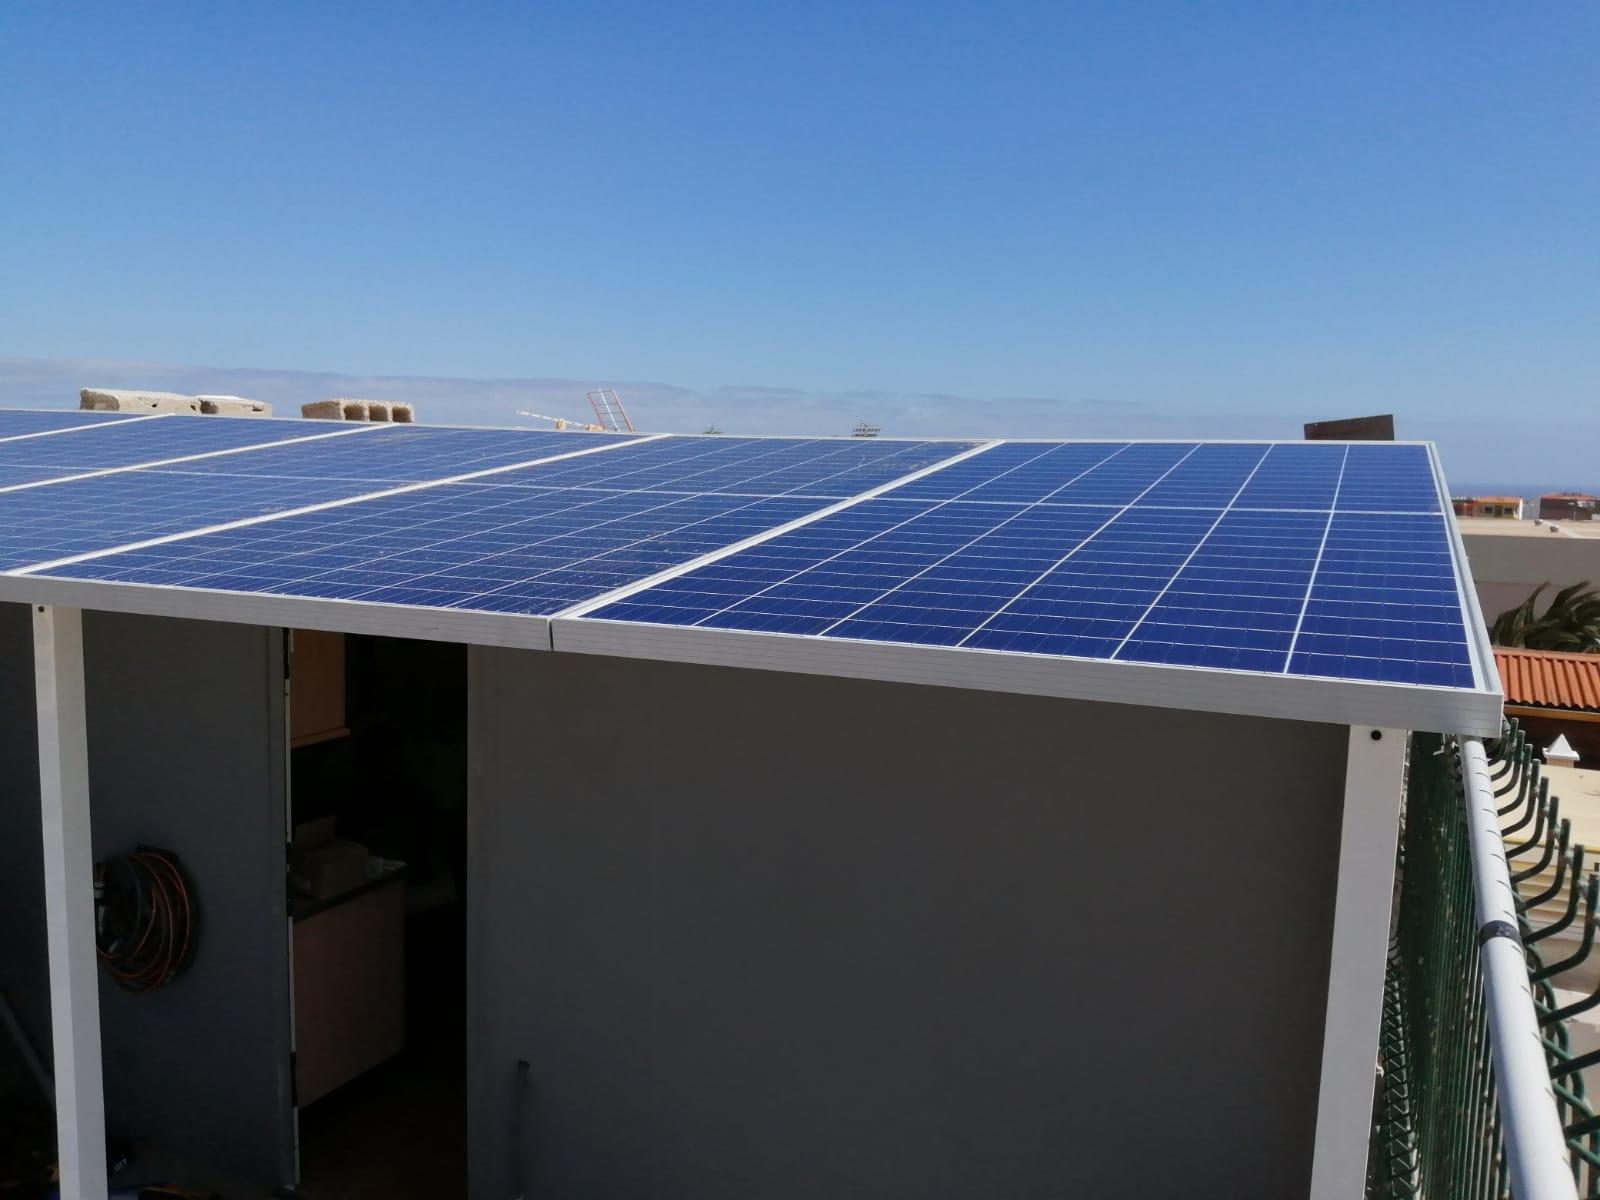 Instalación fotovoltaica - Vecindario